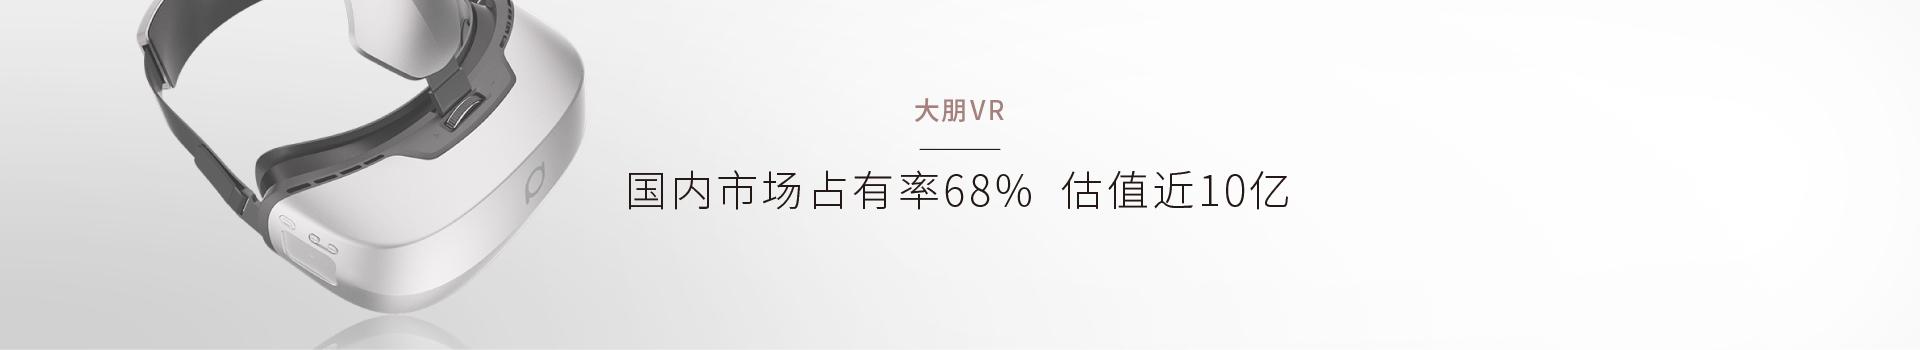 大朋VR經(jing)典企(qi)業營(ying)銷策劃案例(li),通過與(yu)奇正(zheng)沐古的合(he)xian)鰨 mu)前(qian)在國內市場的佔有(you)率(lv)高(gao)達(da)68%,平台用戶(hu)高(gao)達(da)1500萬。